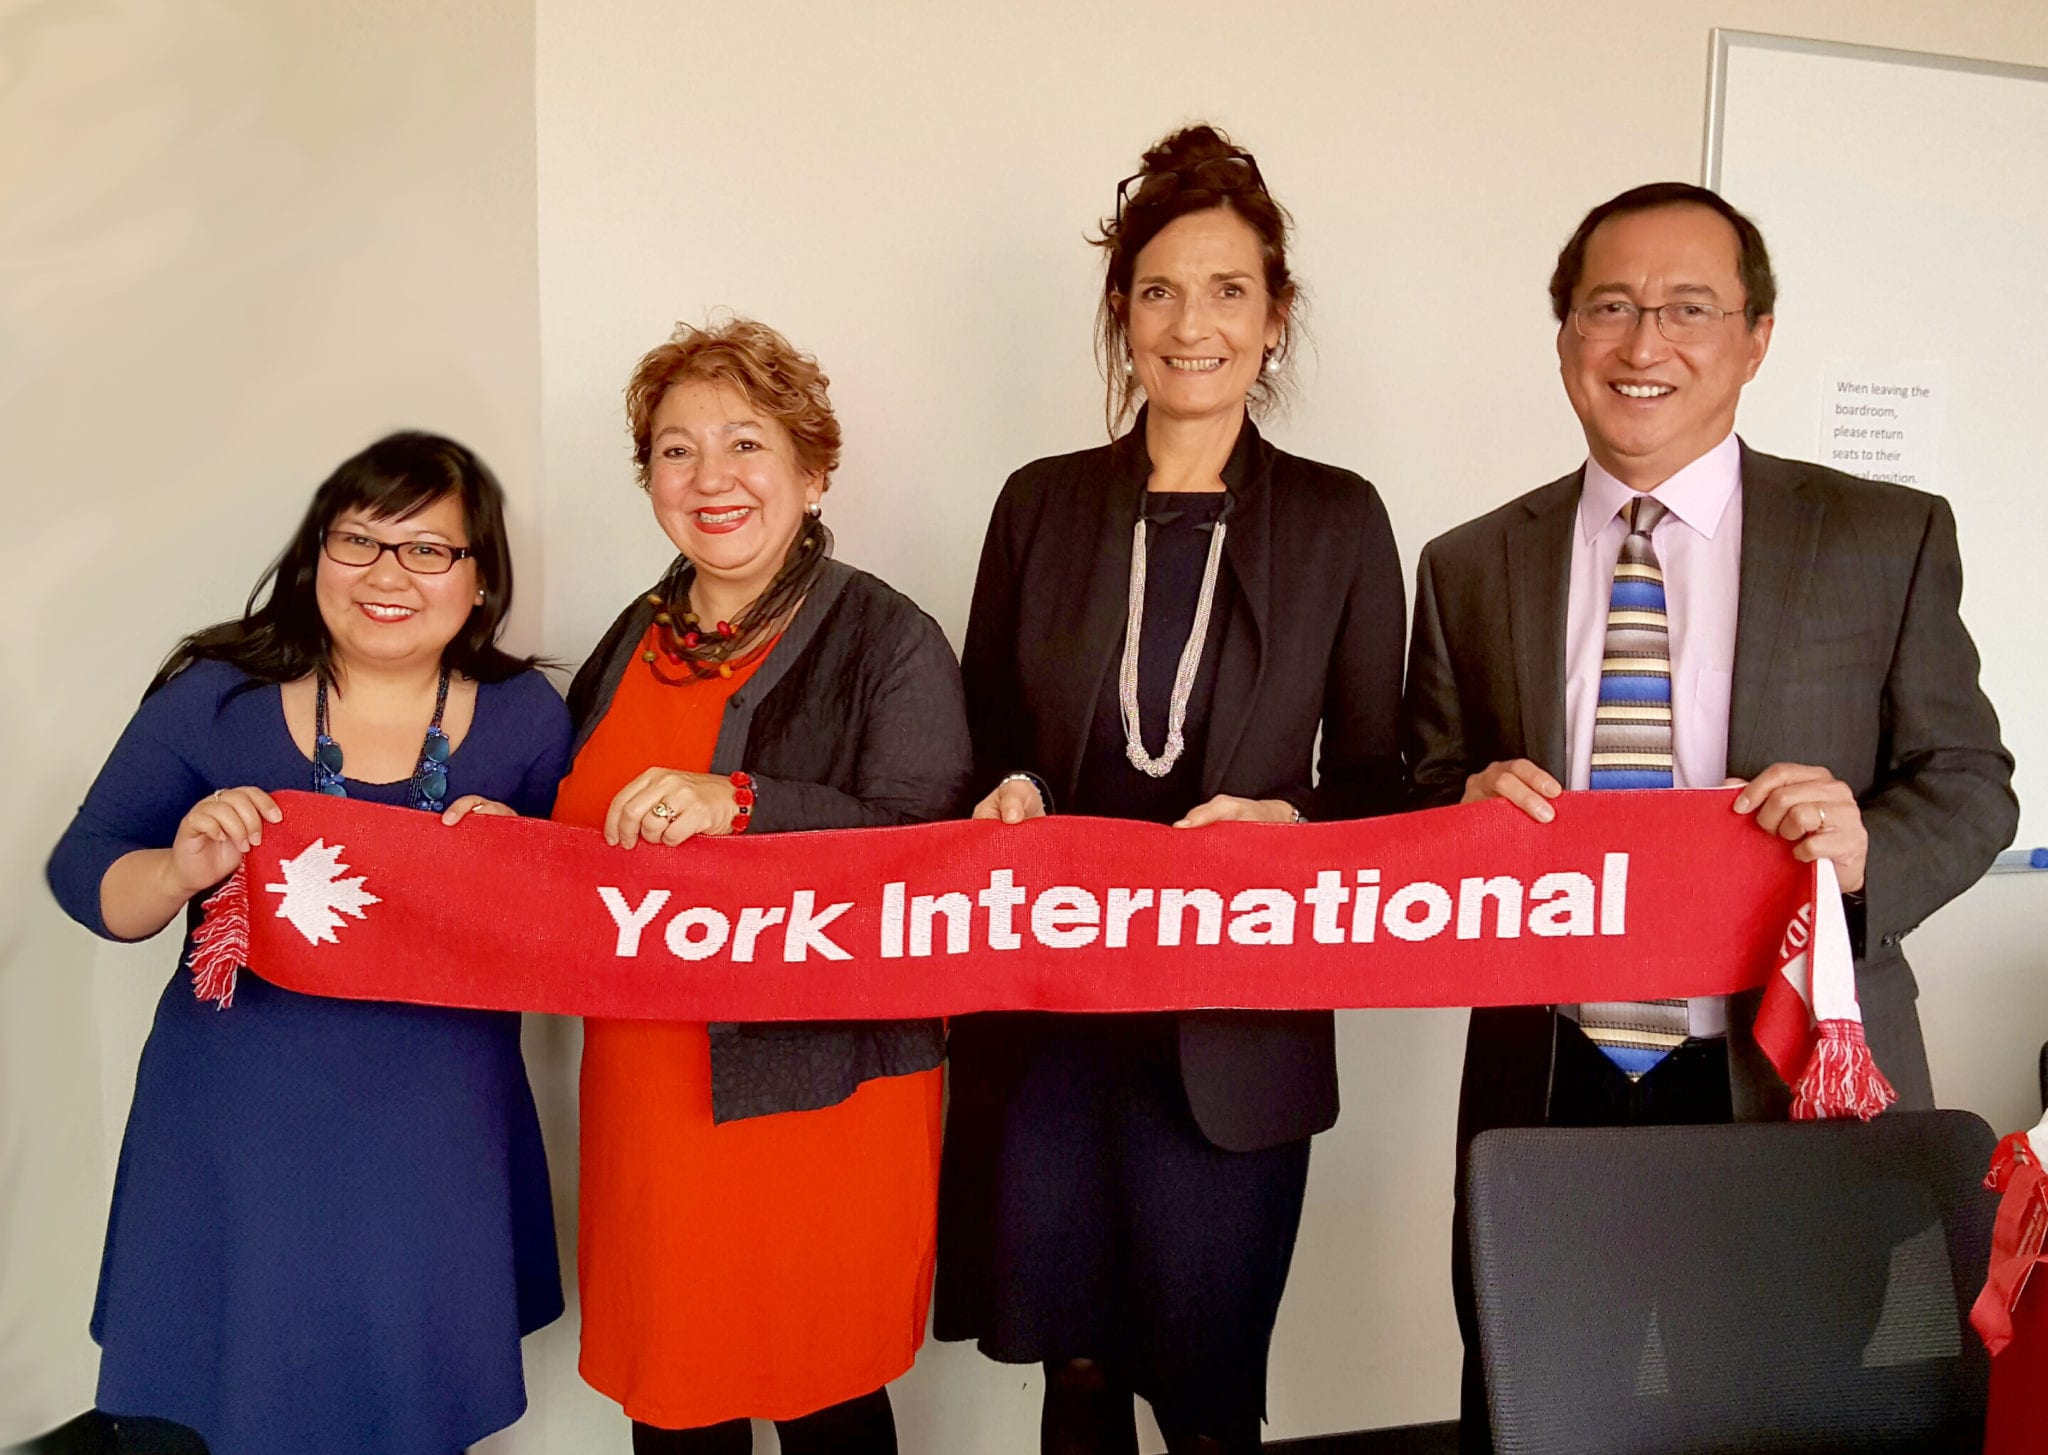 November 18, 2016 York International, School of Administrative Studies and ZHAW School Of Management and Law, Switzerland